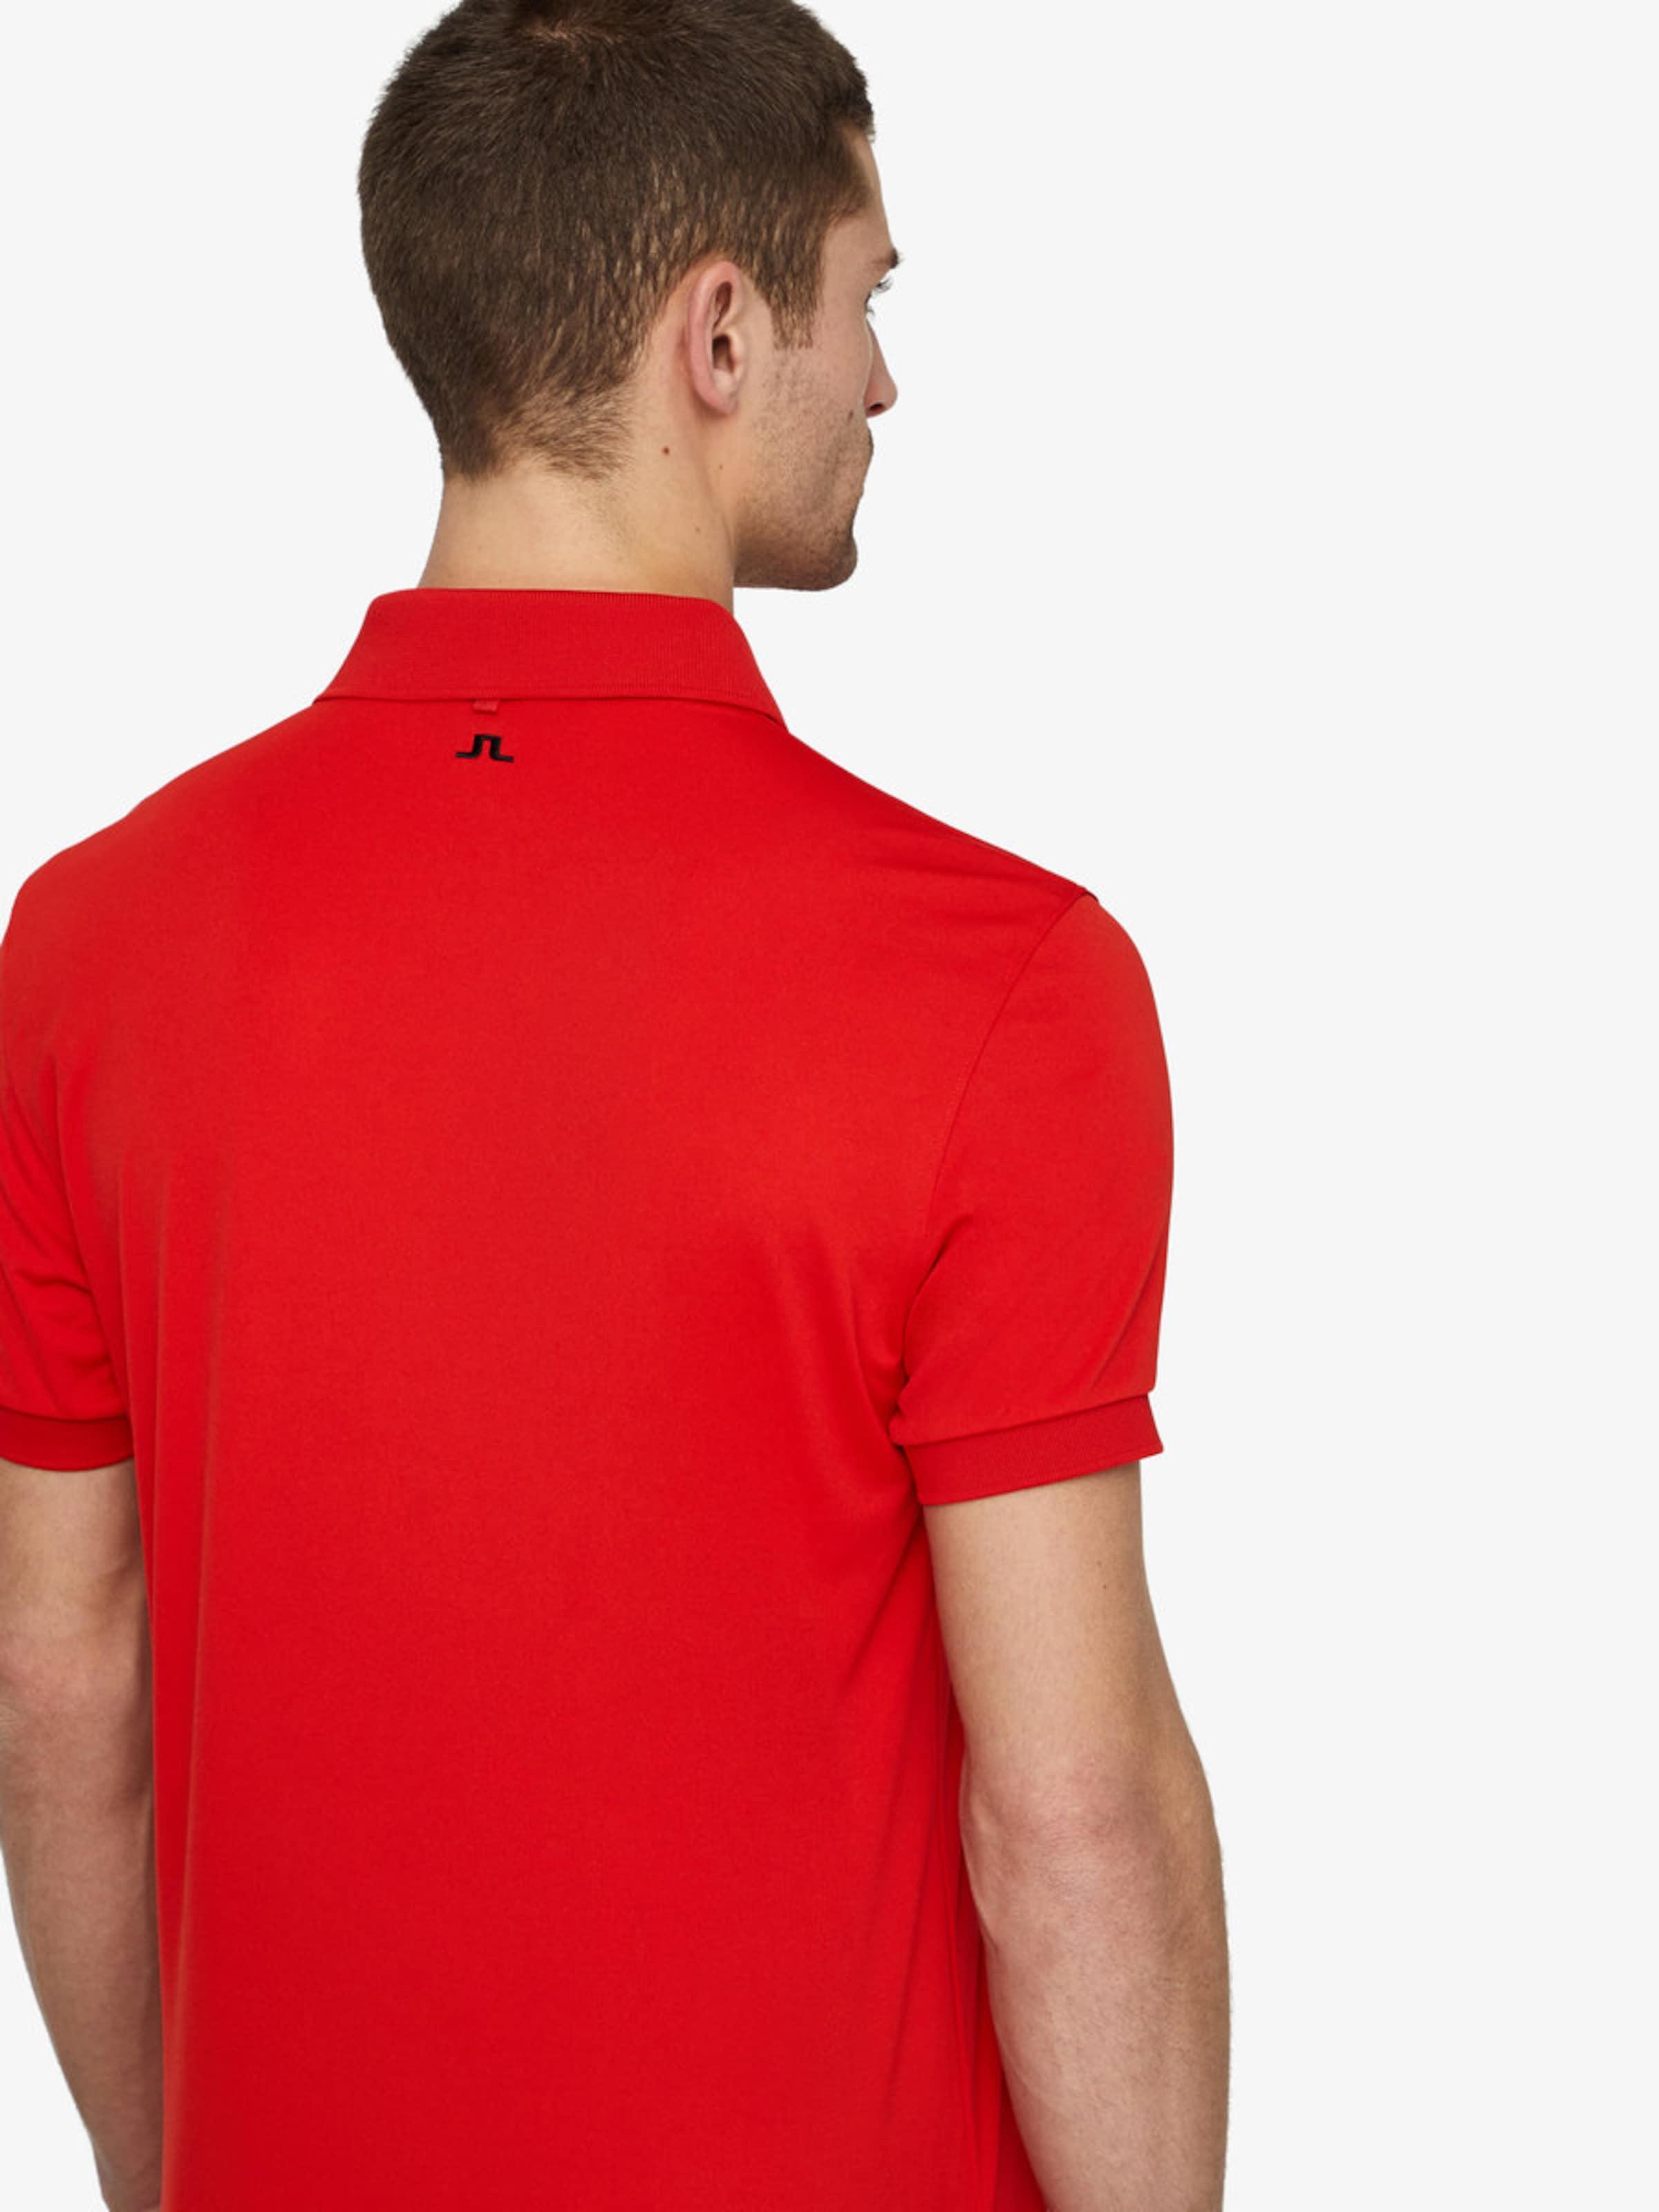 lindeberg En J shirt T Rouge NX0kOnP8wZ